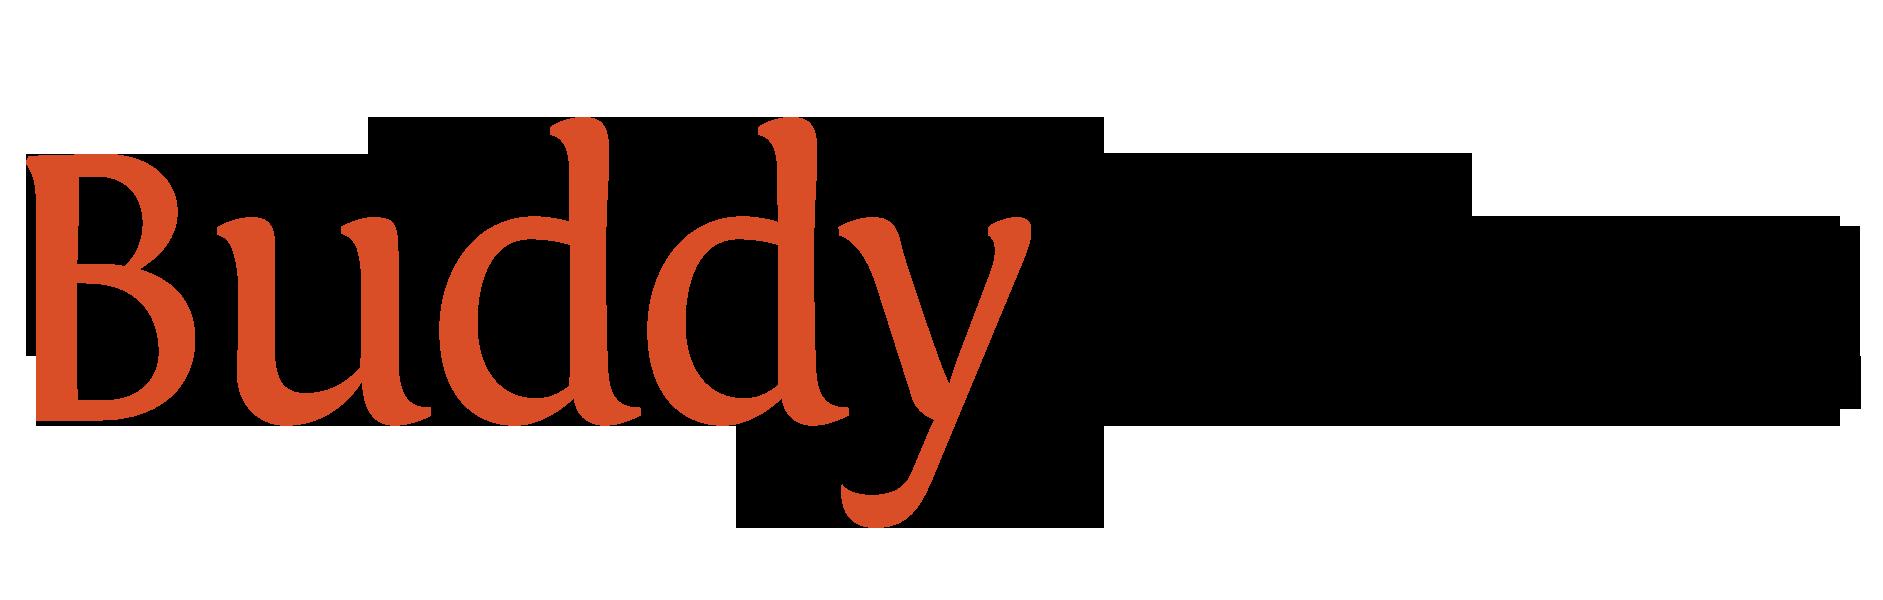 buddypress theme development pdf download